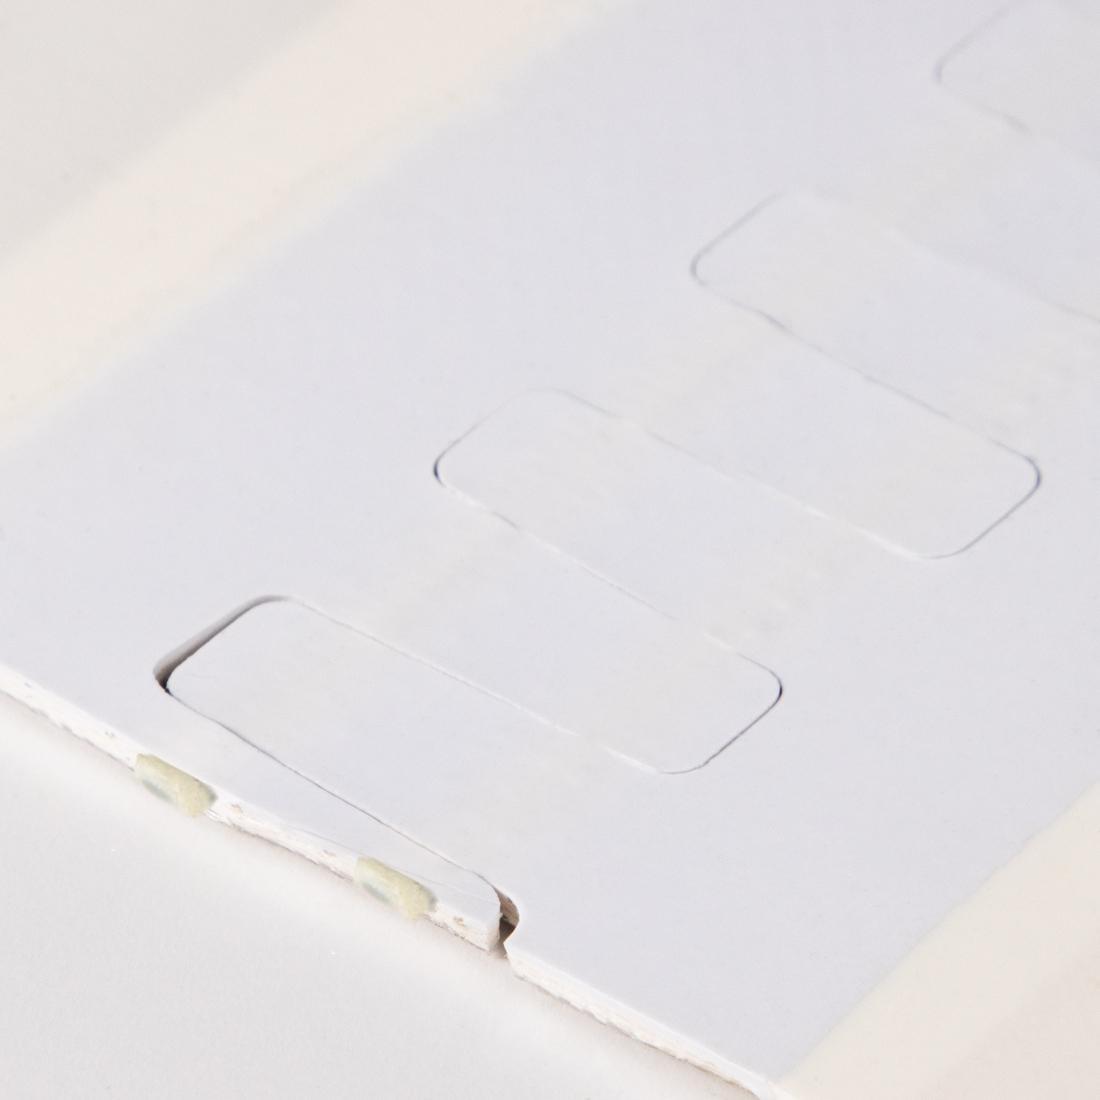 flexibler PVC/PU-Verbinder